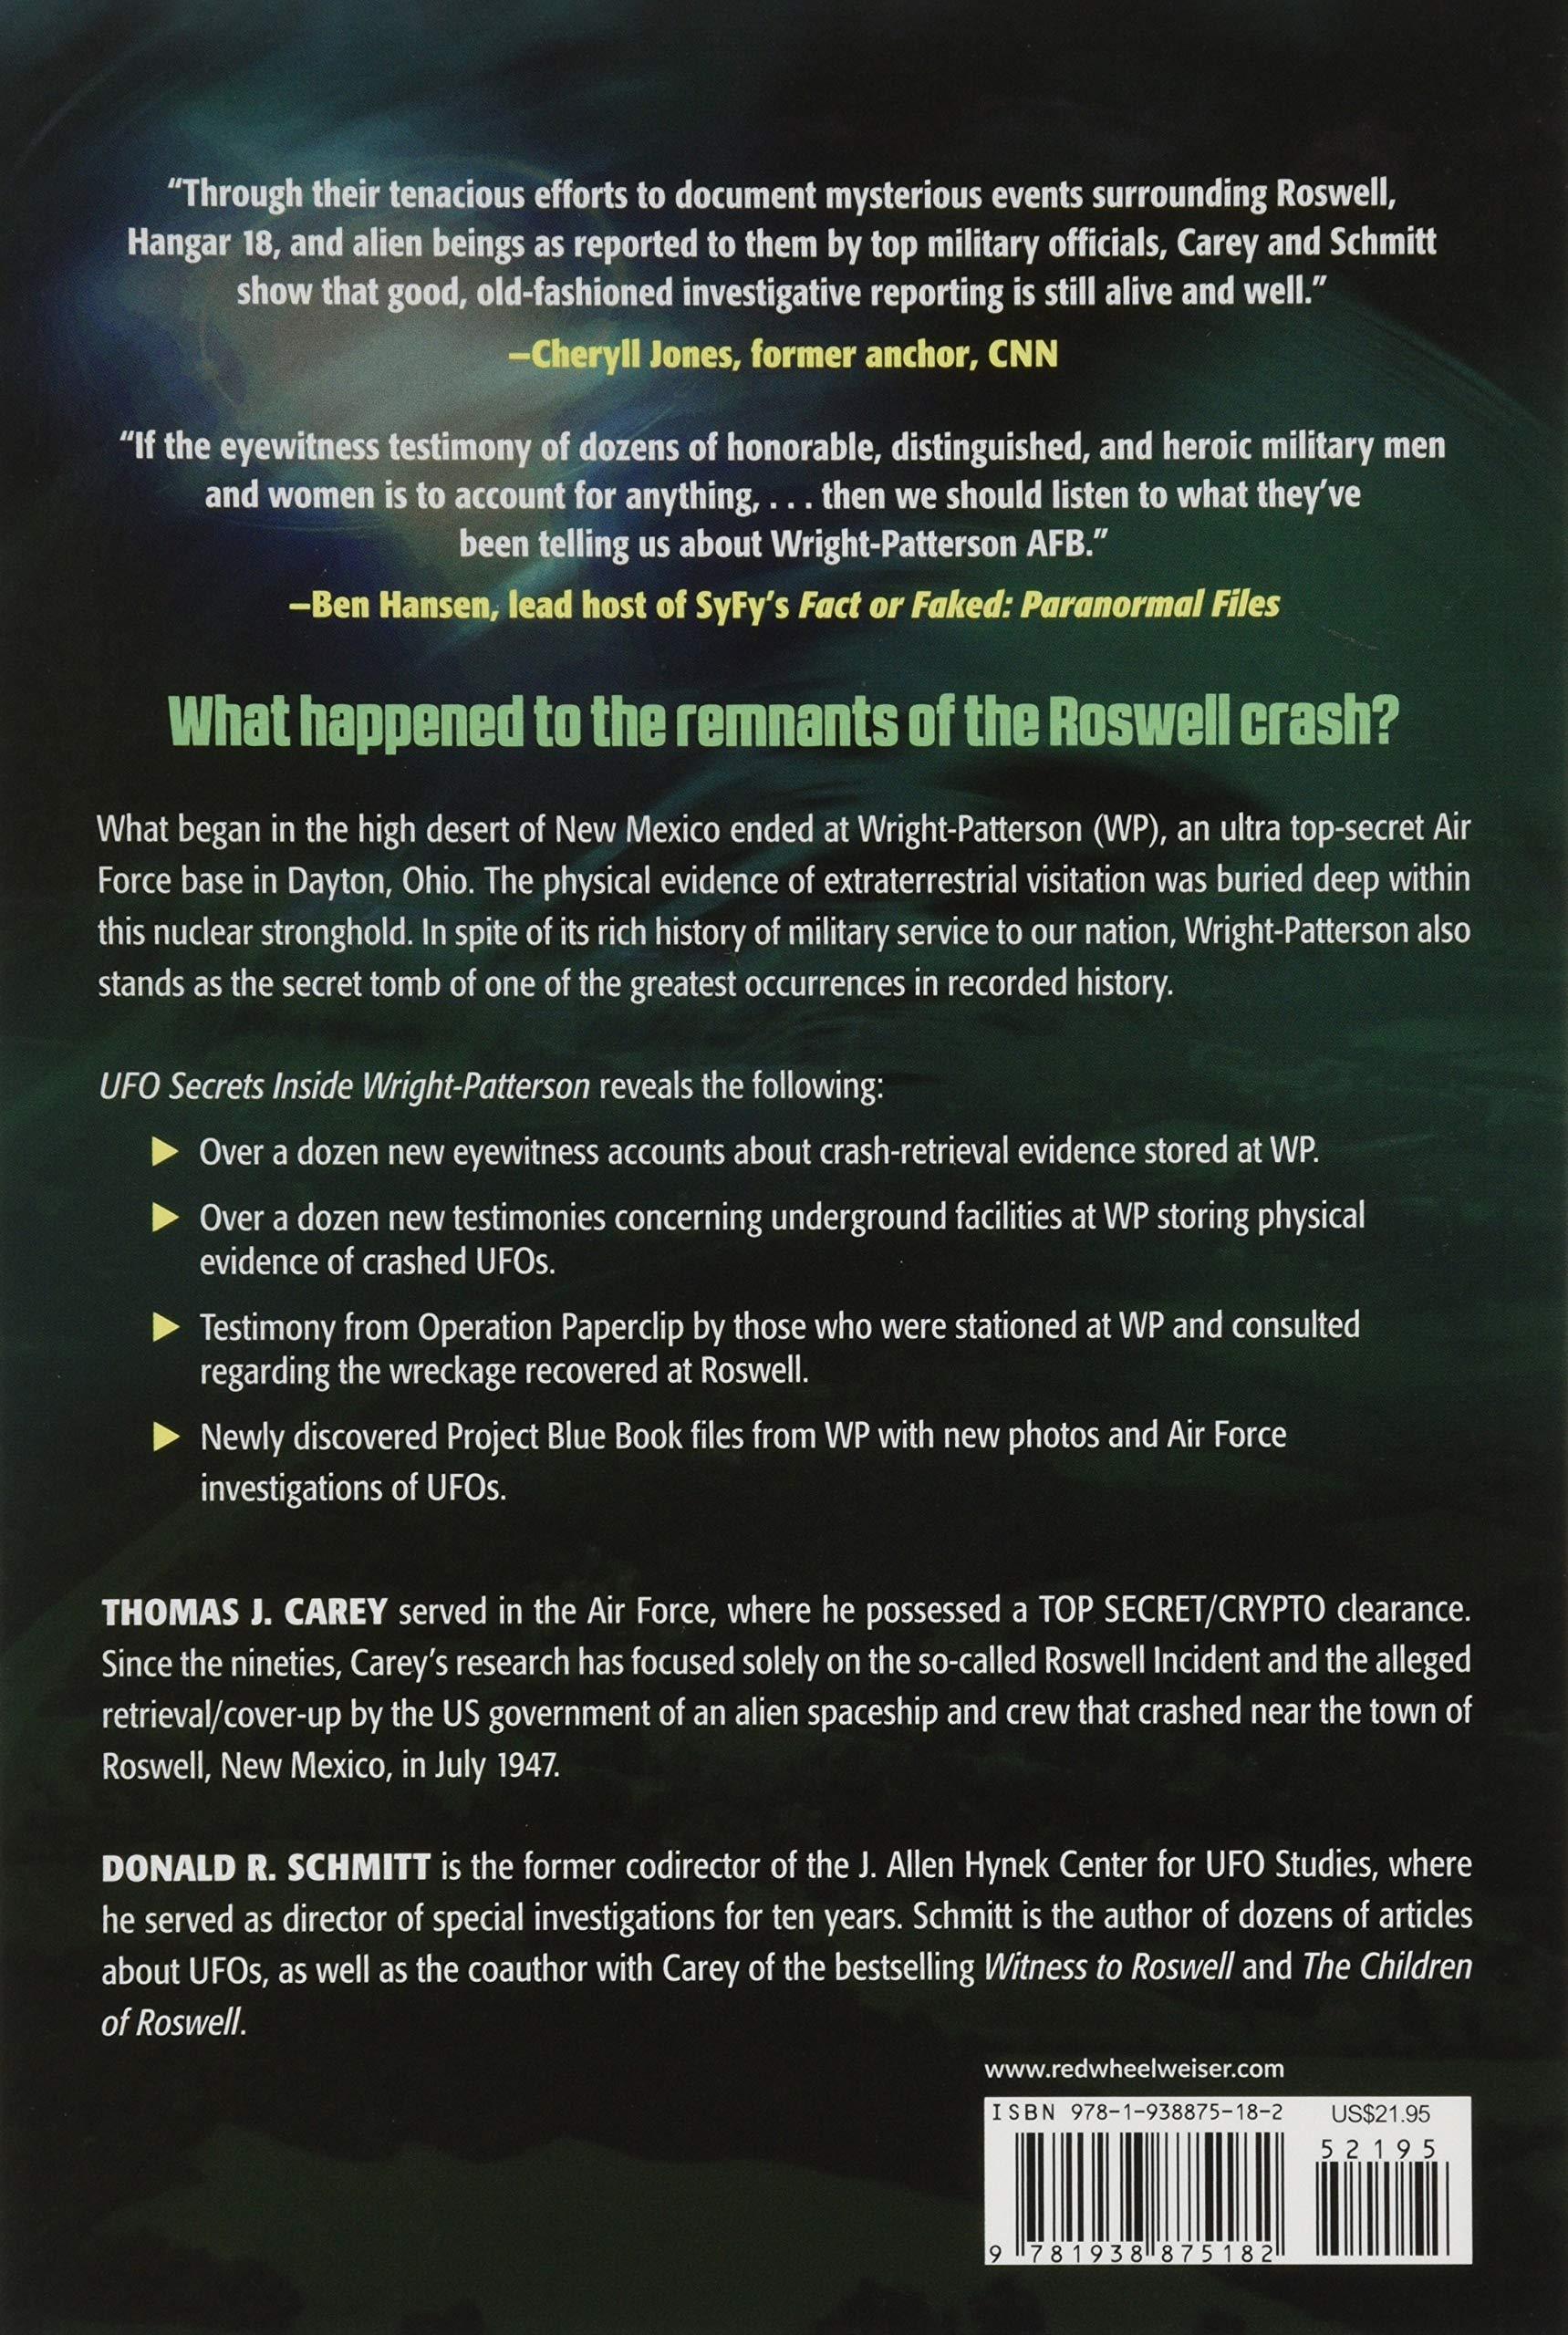 Ufo Secrets Inside Wright Patterson Eyewitness Accounts From The Real Area 51 Carey Thomas J Schmitt Donald R Friedman Stanton T 9781938875182 Amazon Com Books